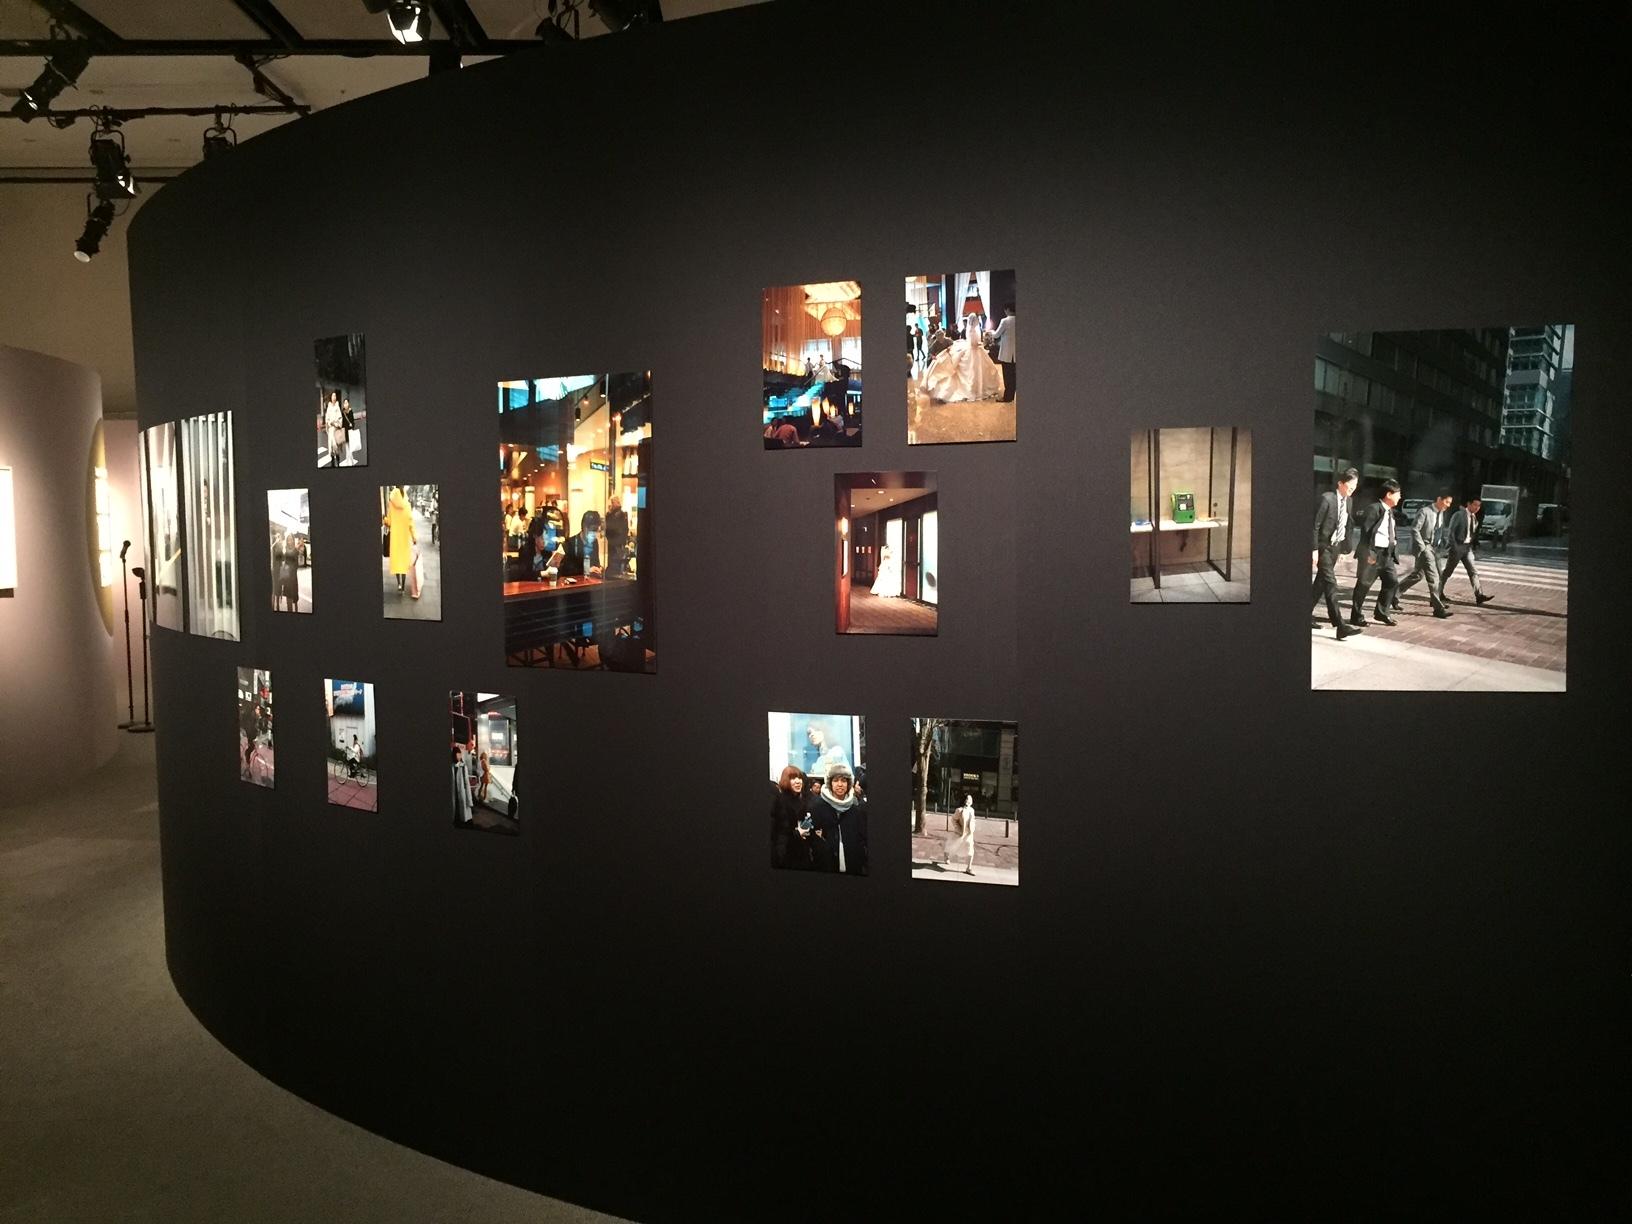 """DEPARDON/TOKYO 1964-2016""摄影展现场照片 ©️ 小池タカエ"